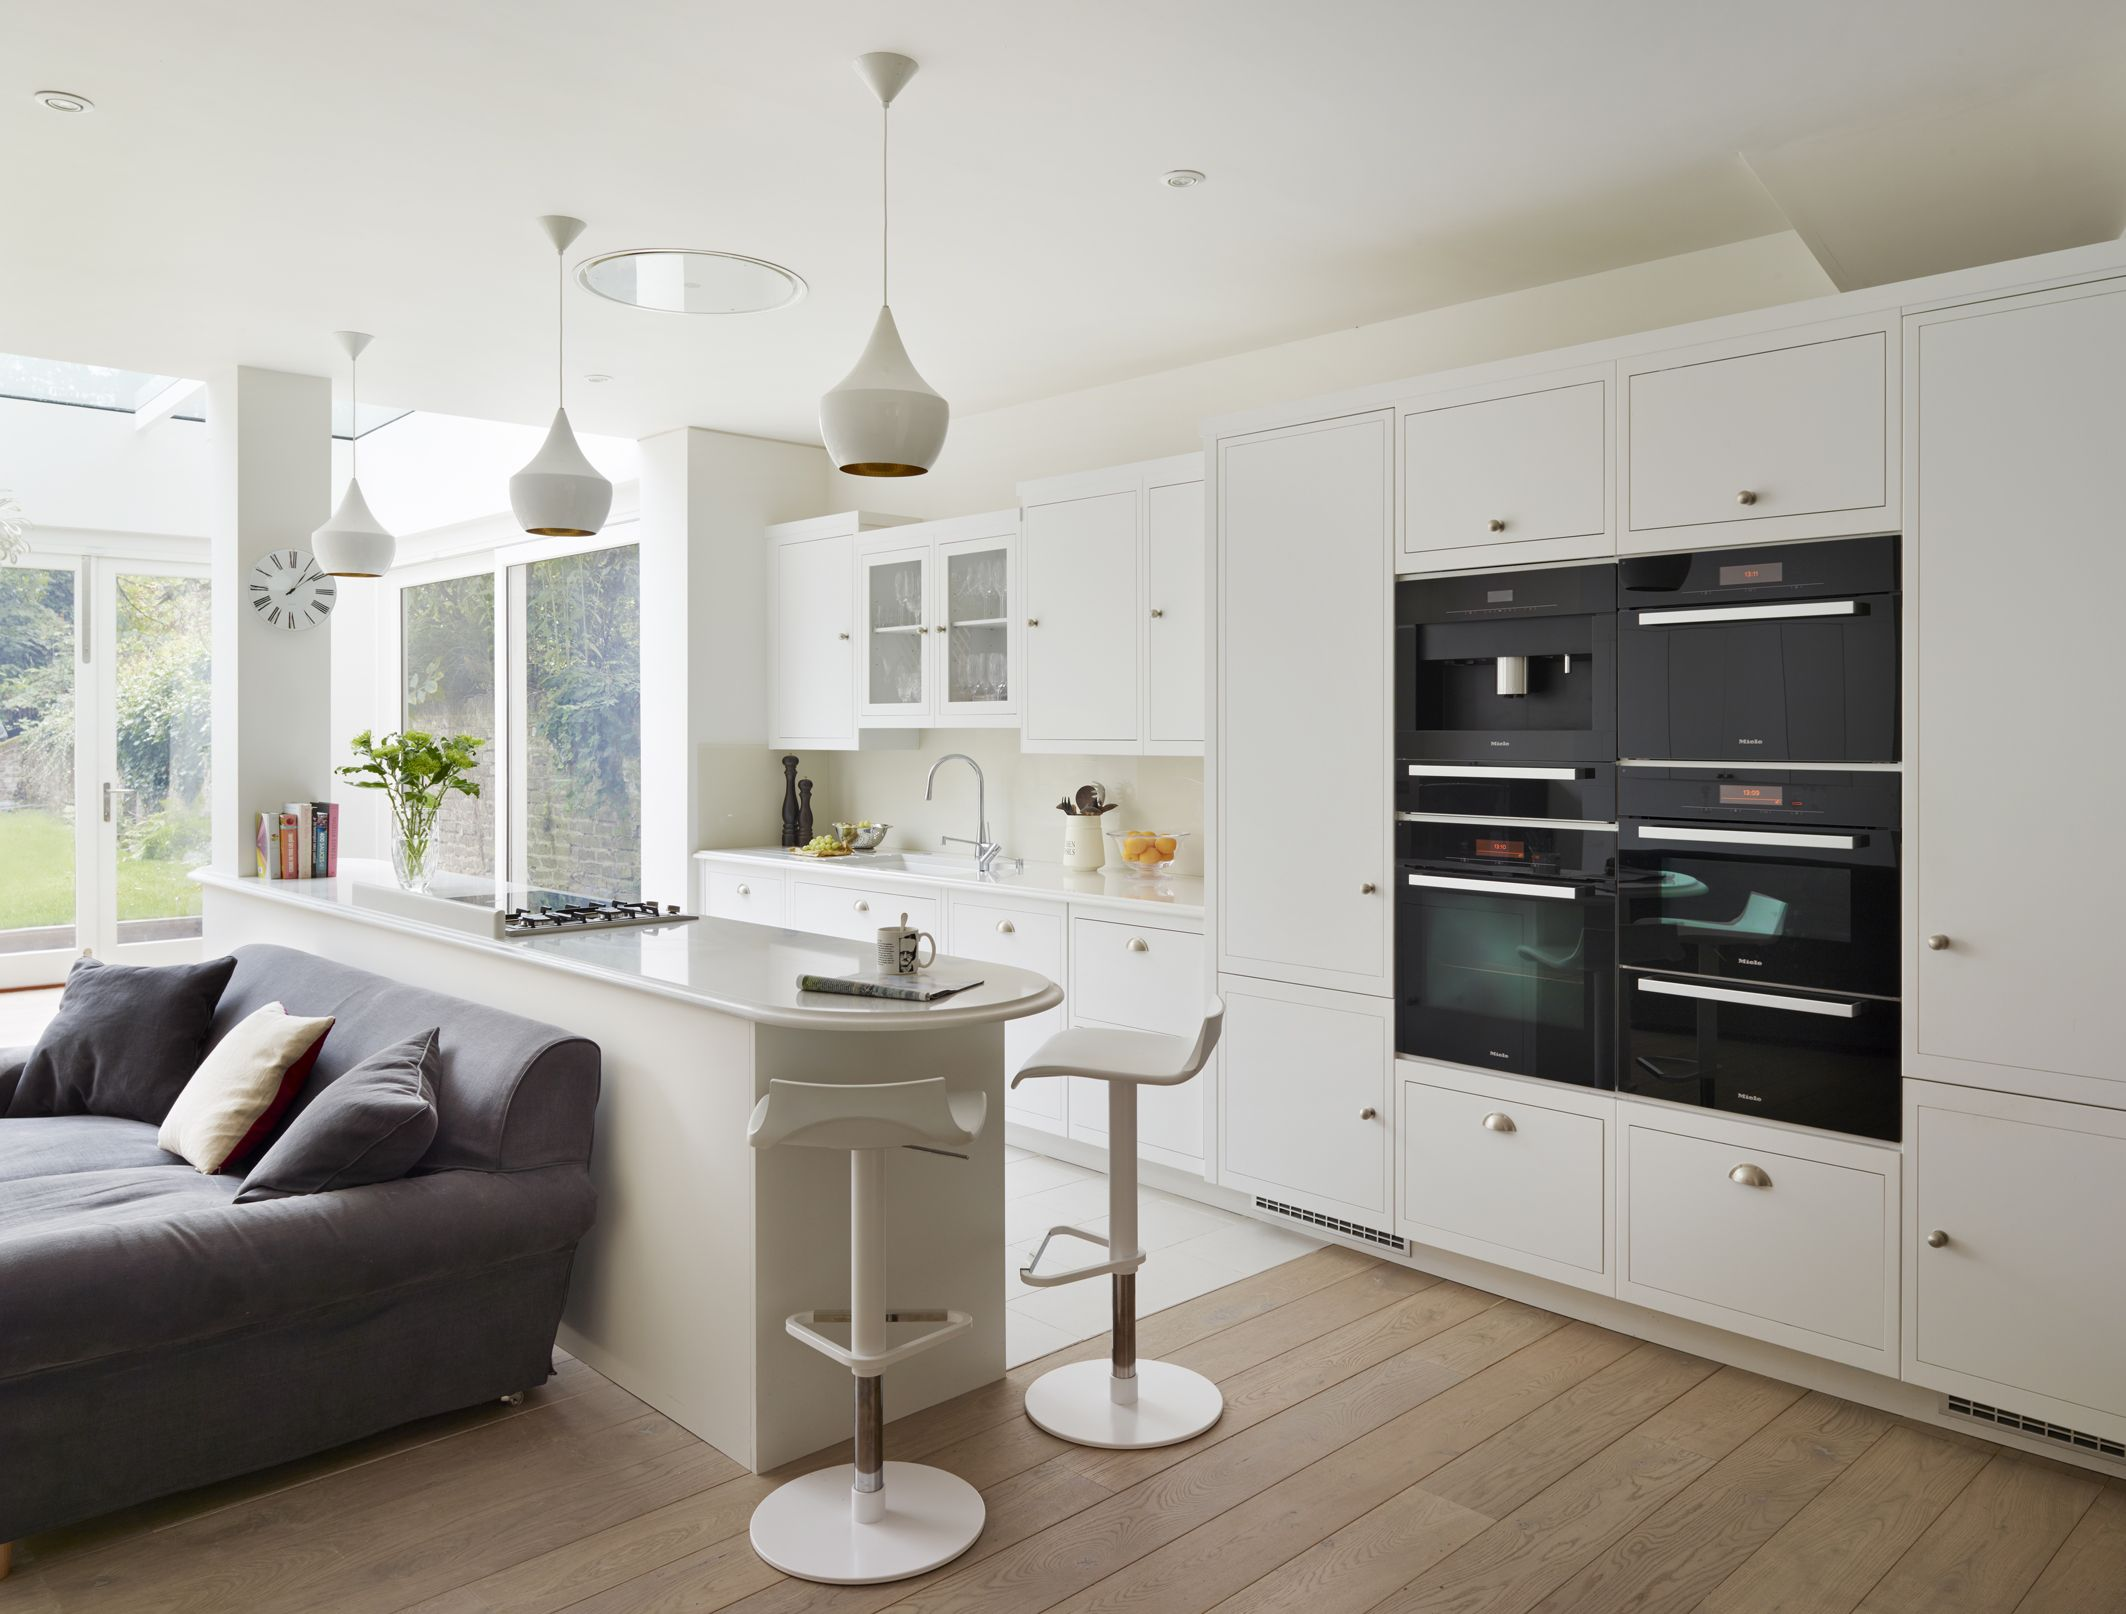 Harvey jones linear kitchen painted in dulux 39 swedish for Linear kitchen design